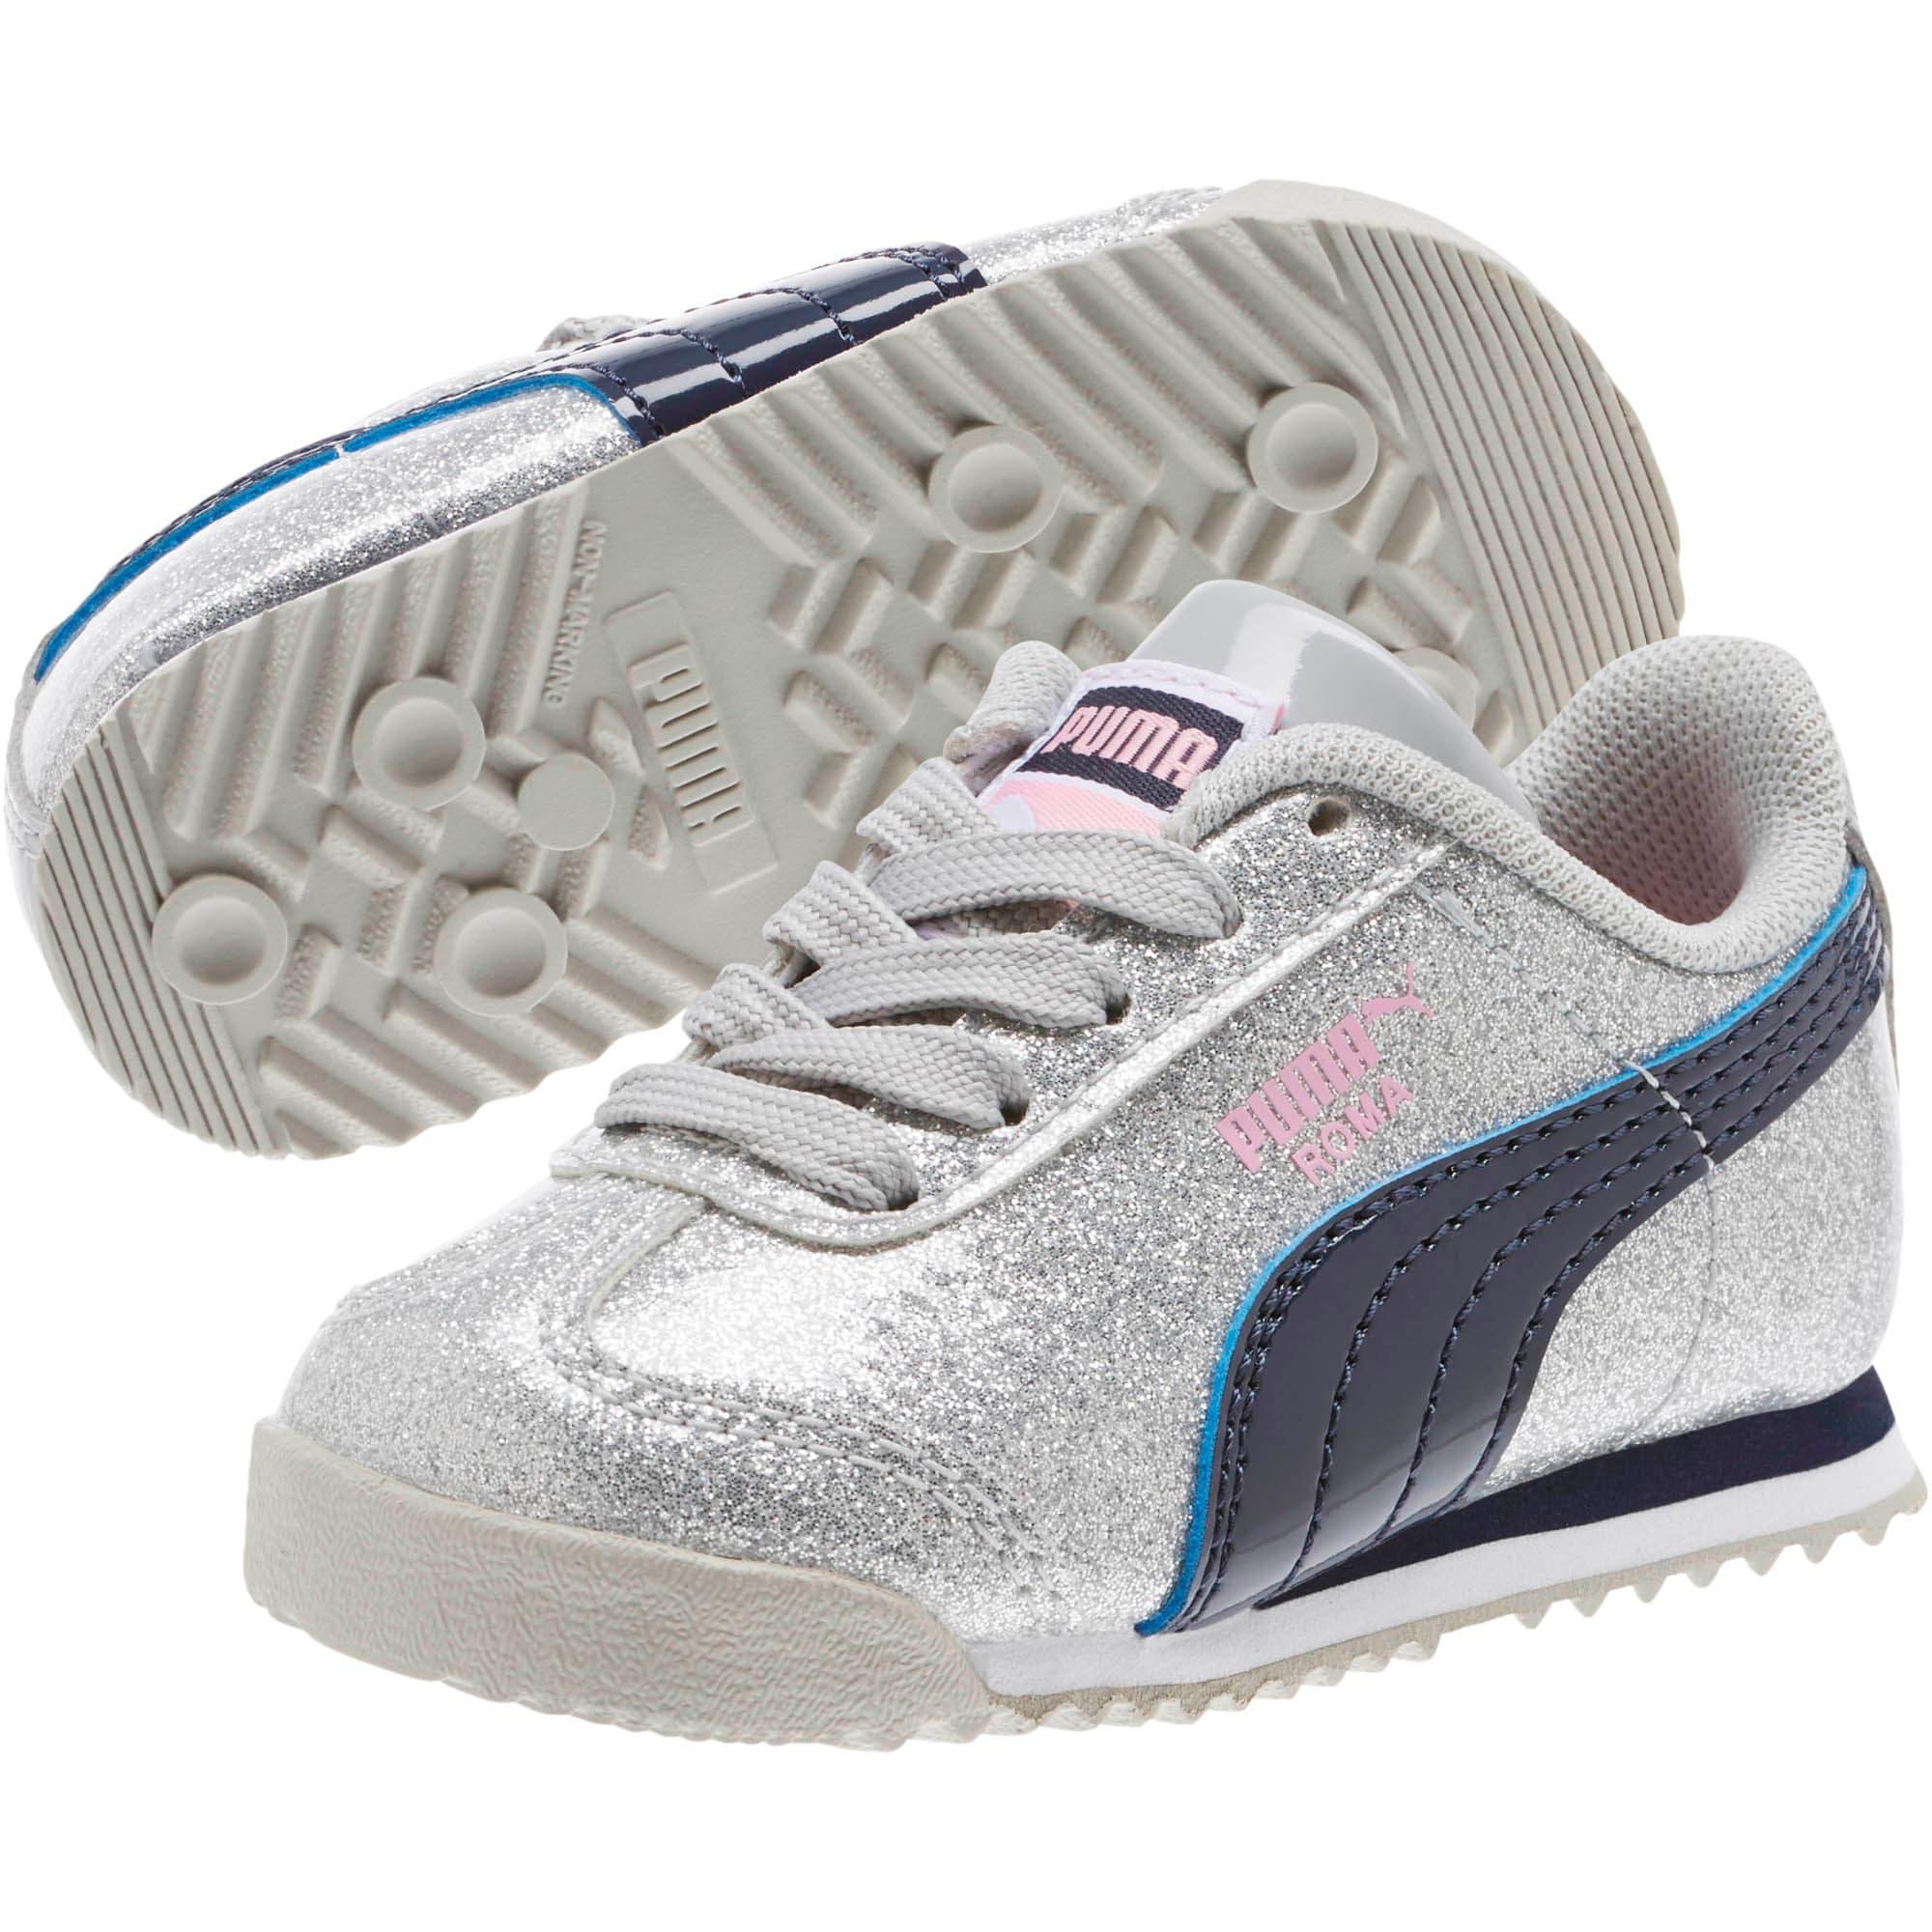 Thumbnail 2 of Roma Glam INF Shoes, Gray Violet-Peacoat, medium